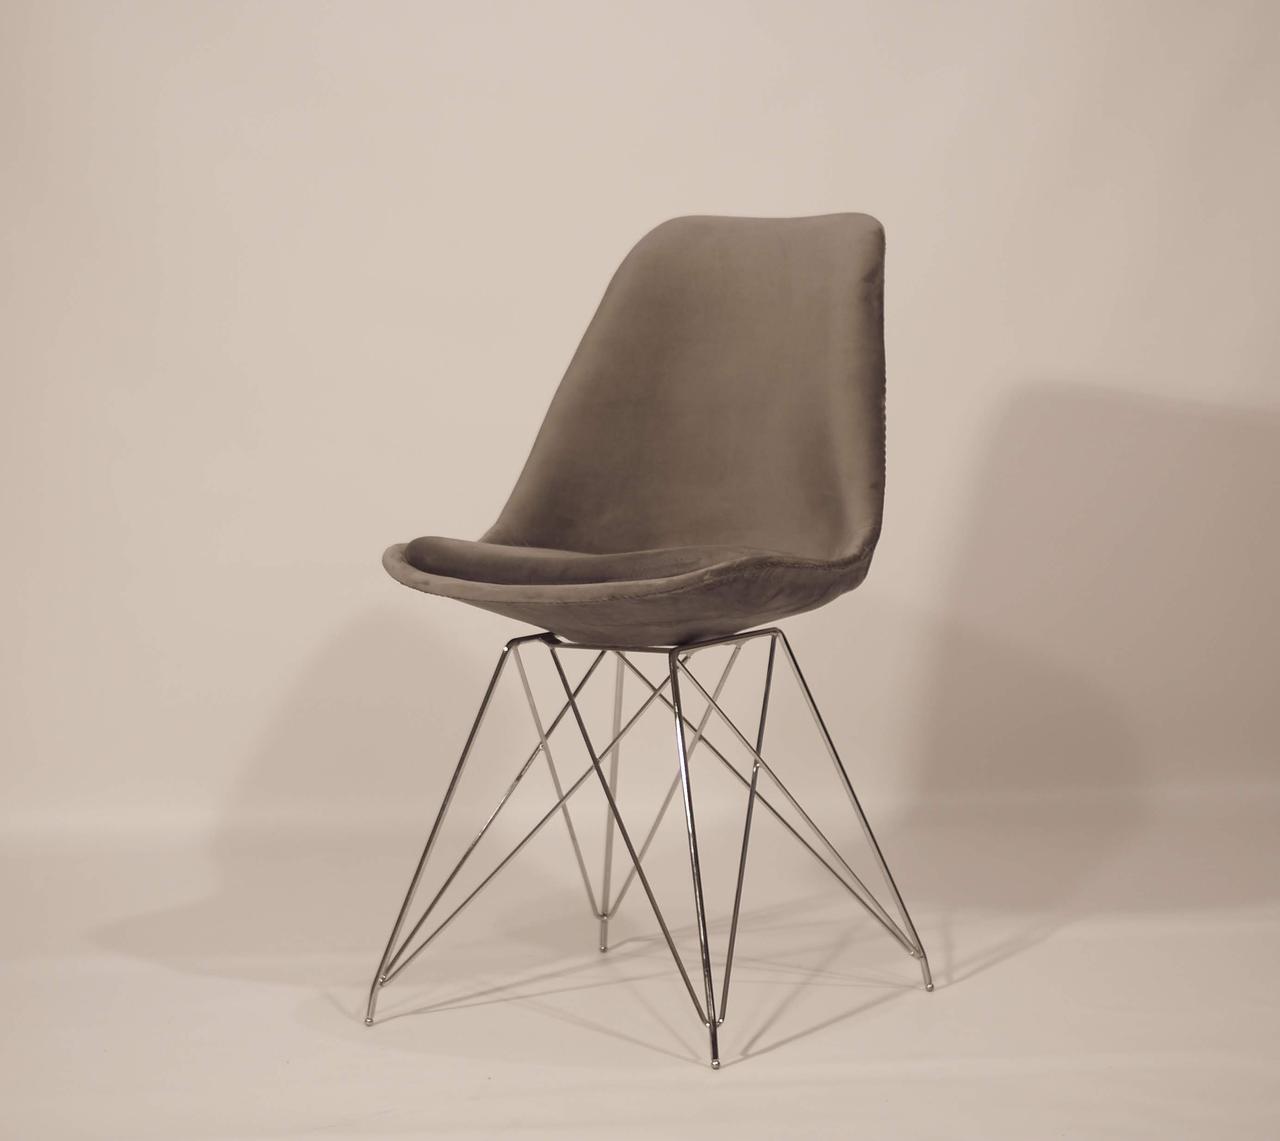 Стул обеденный мягкий на хромированных ножках  Milan Soft Chrom ML Бархат, цвет серый